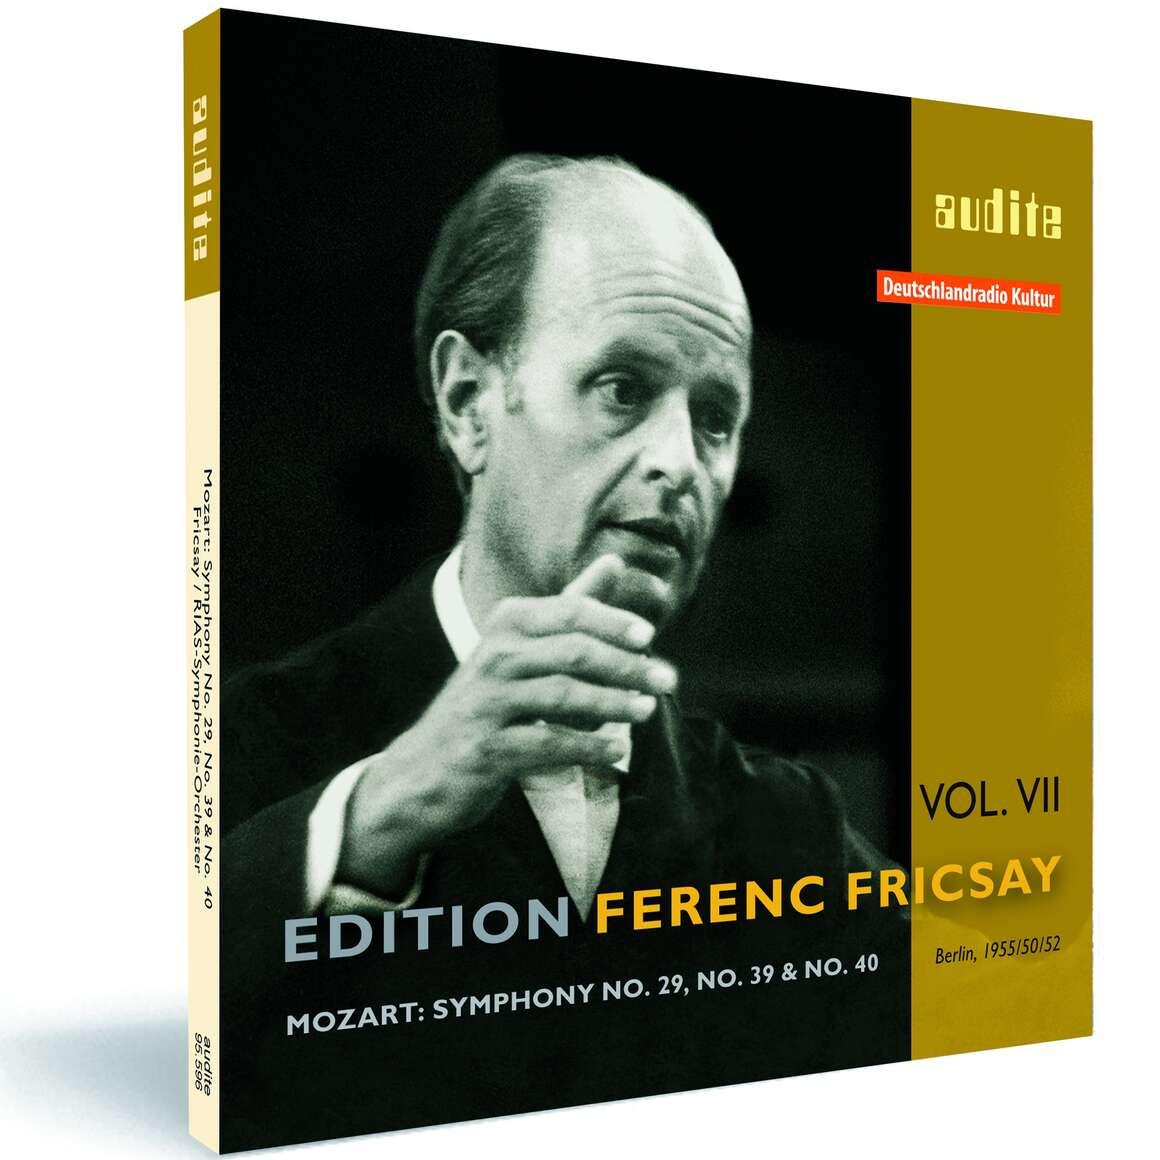 Edition Ferenc Fricsay (VII) – W.A. Mozart: Symphony No. 29, No. 39 & No. 40